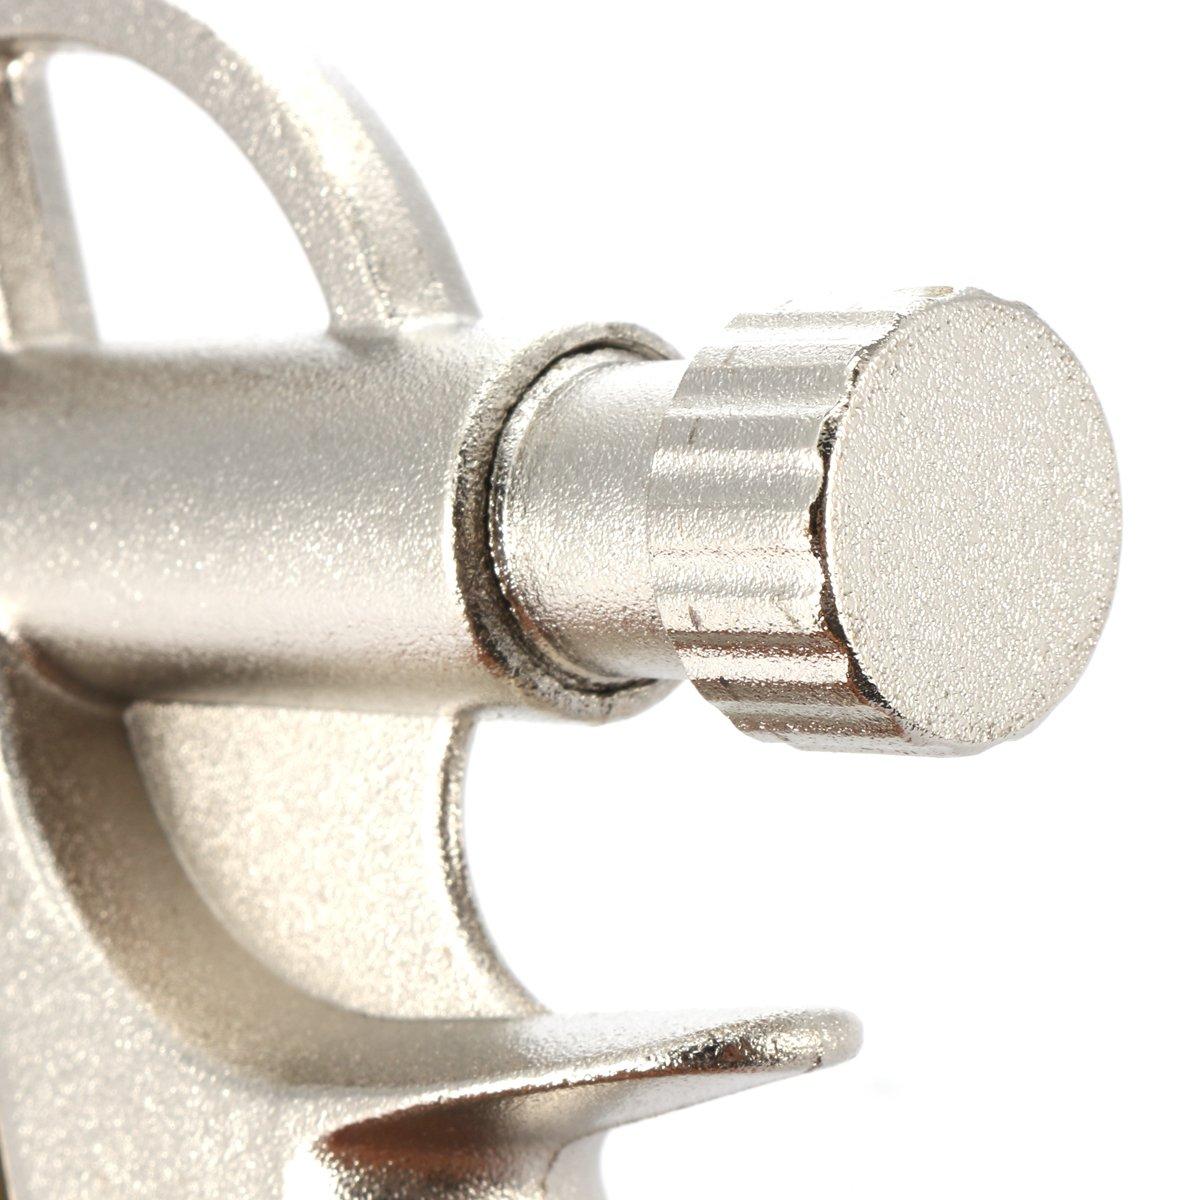 Yingte Foaming Gun,Professional All Metal Spray Foam Gun /Expanding Polyurethane Insulating Tool by Yingte (Image #5)